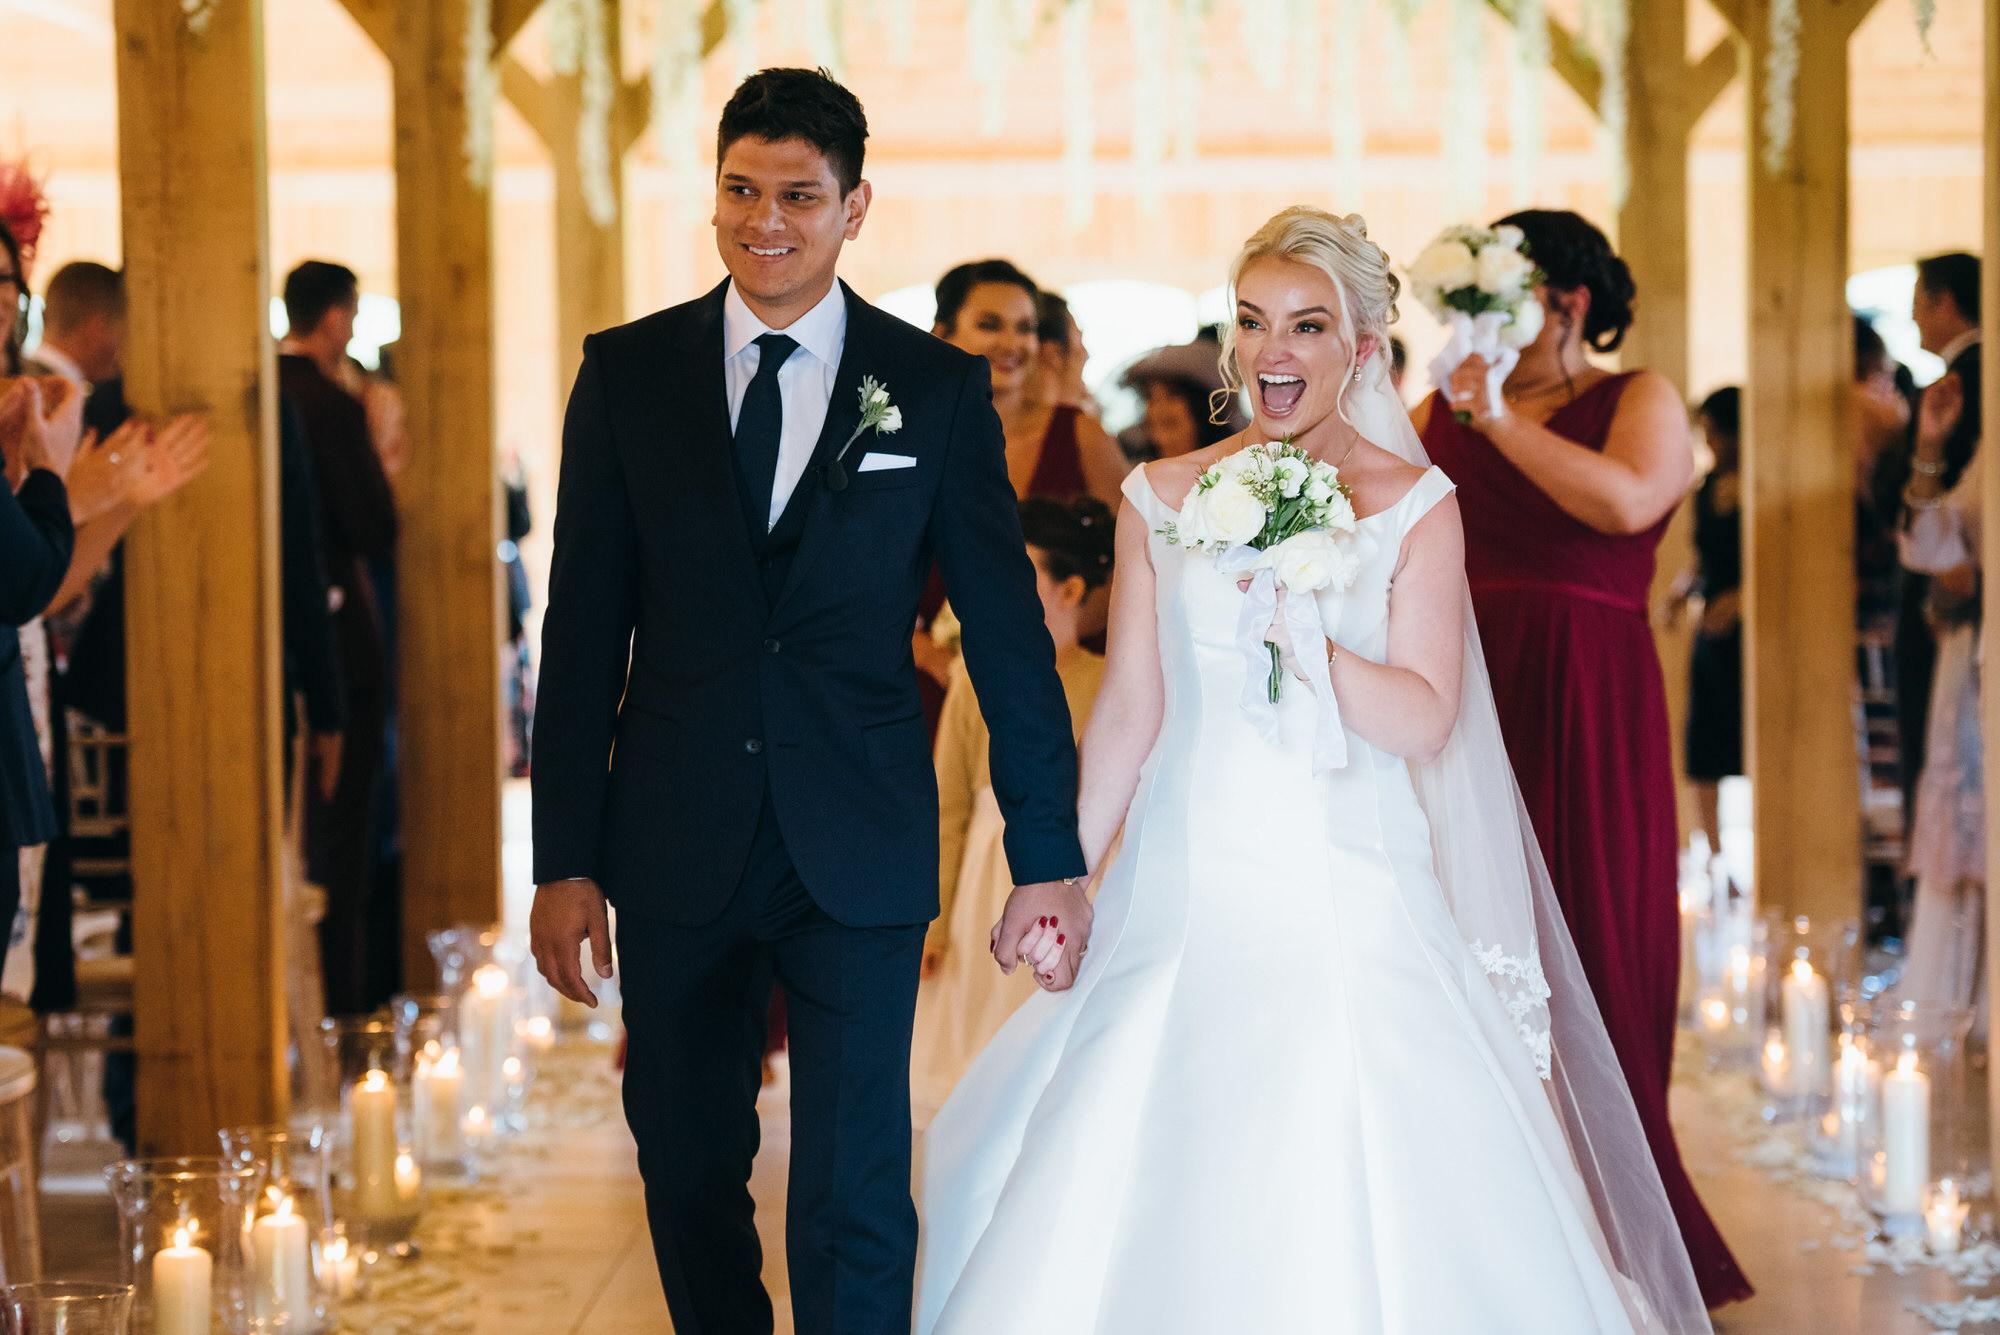 Merrydale manor wedding photography 048